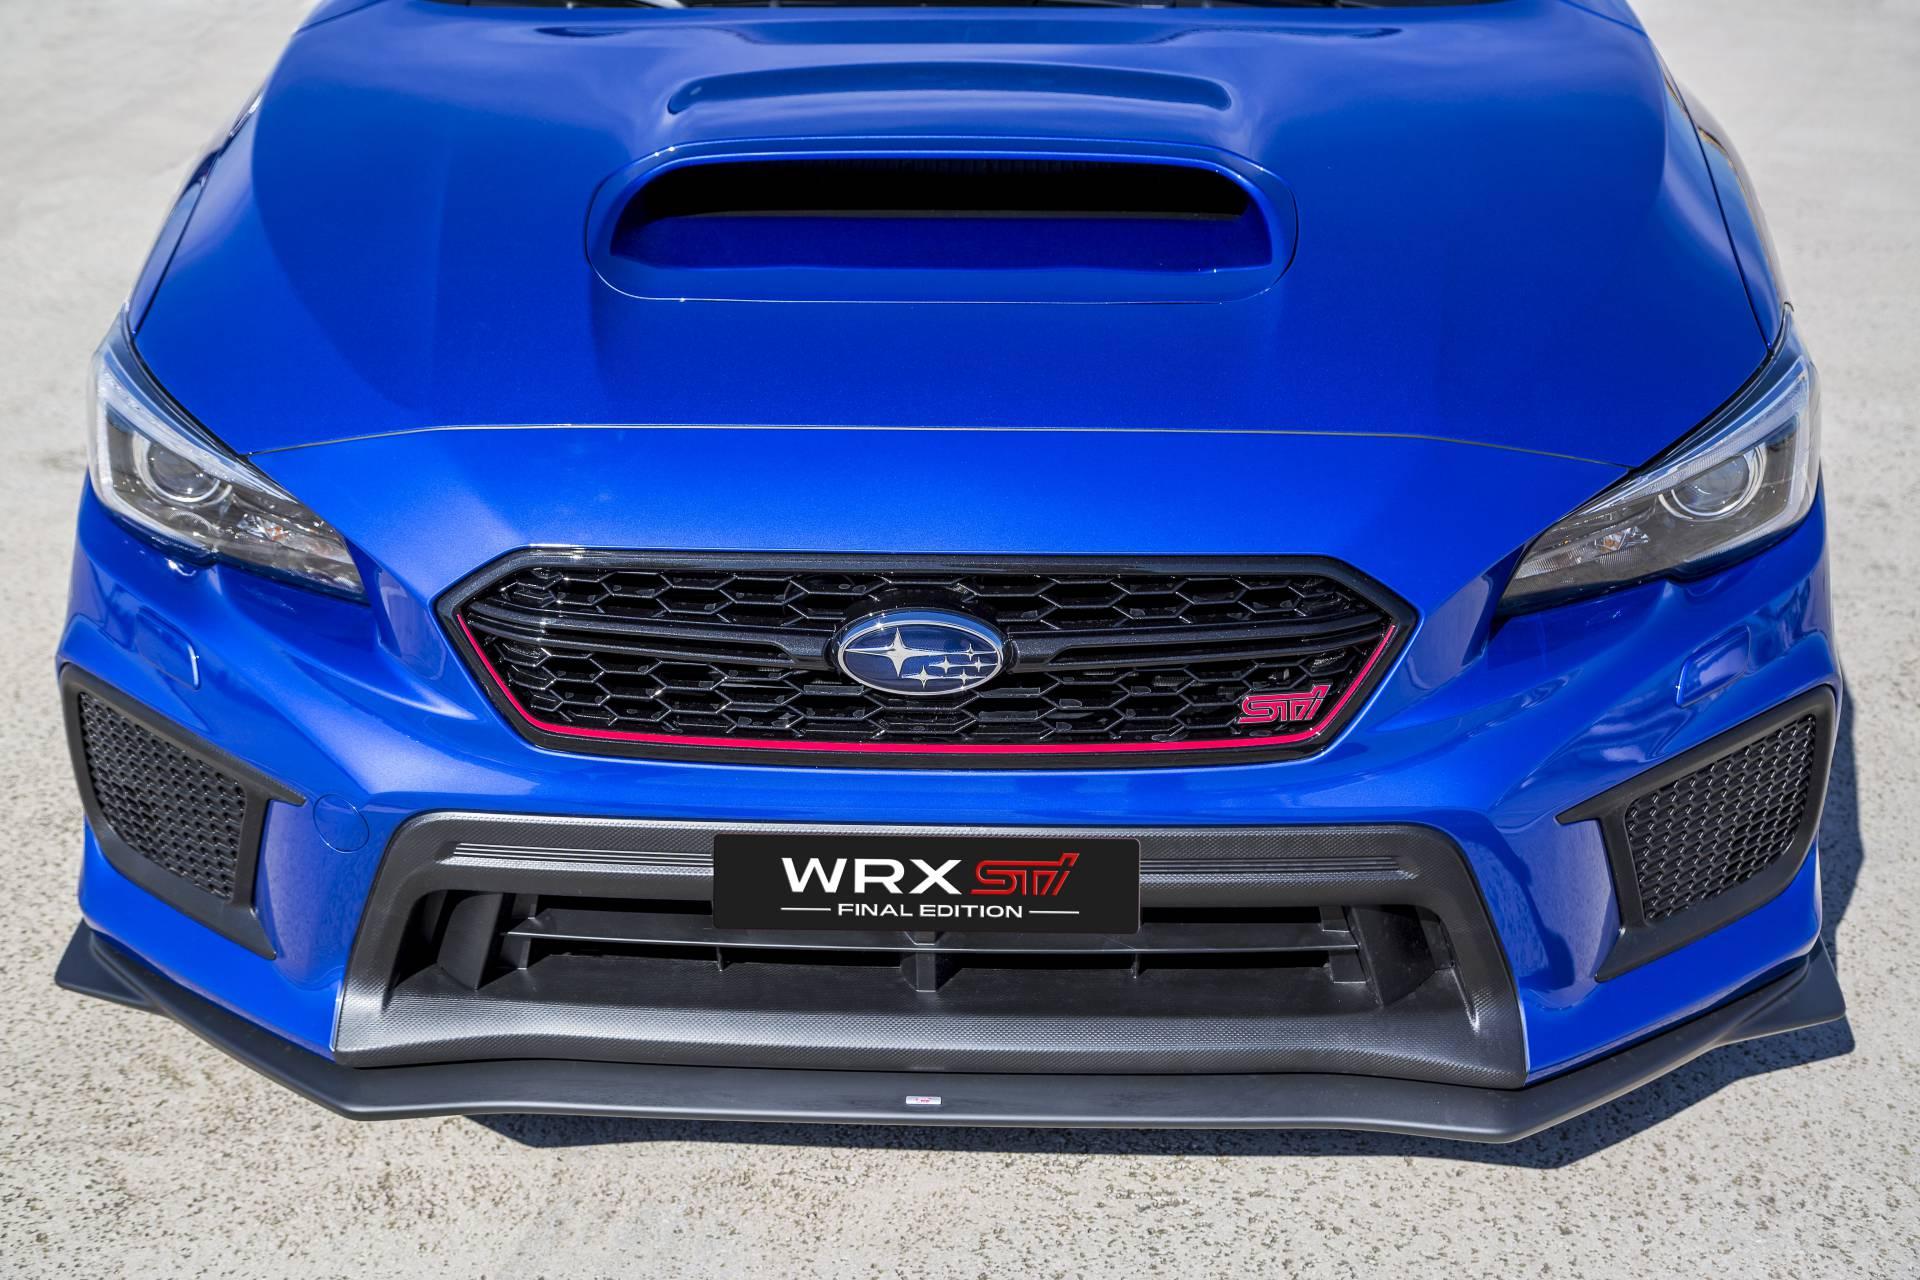 Subaru_WRX_STI_Final_Edition_0006